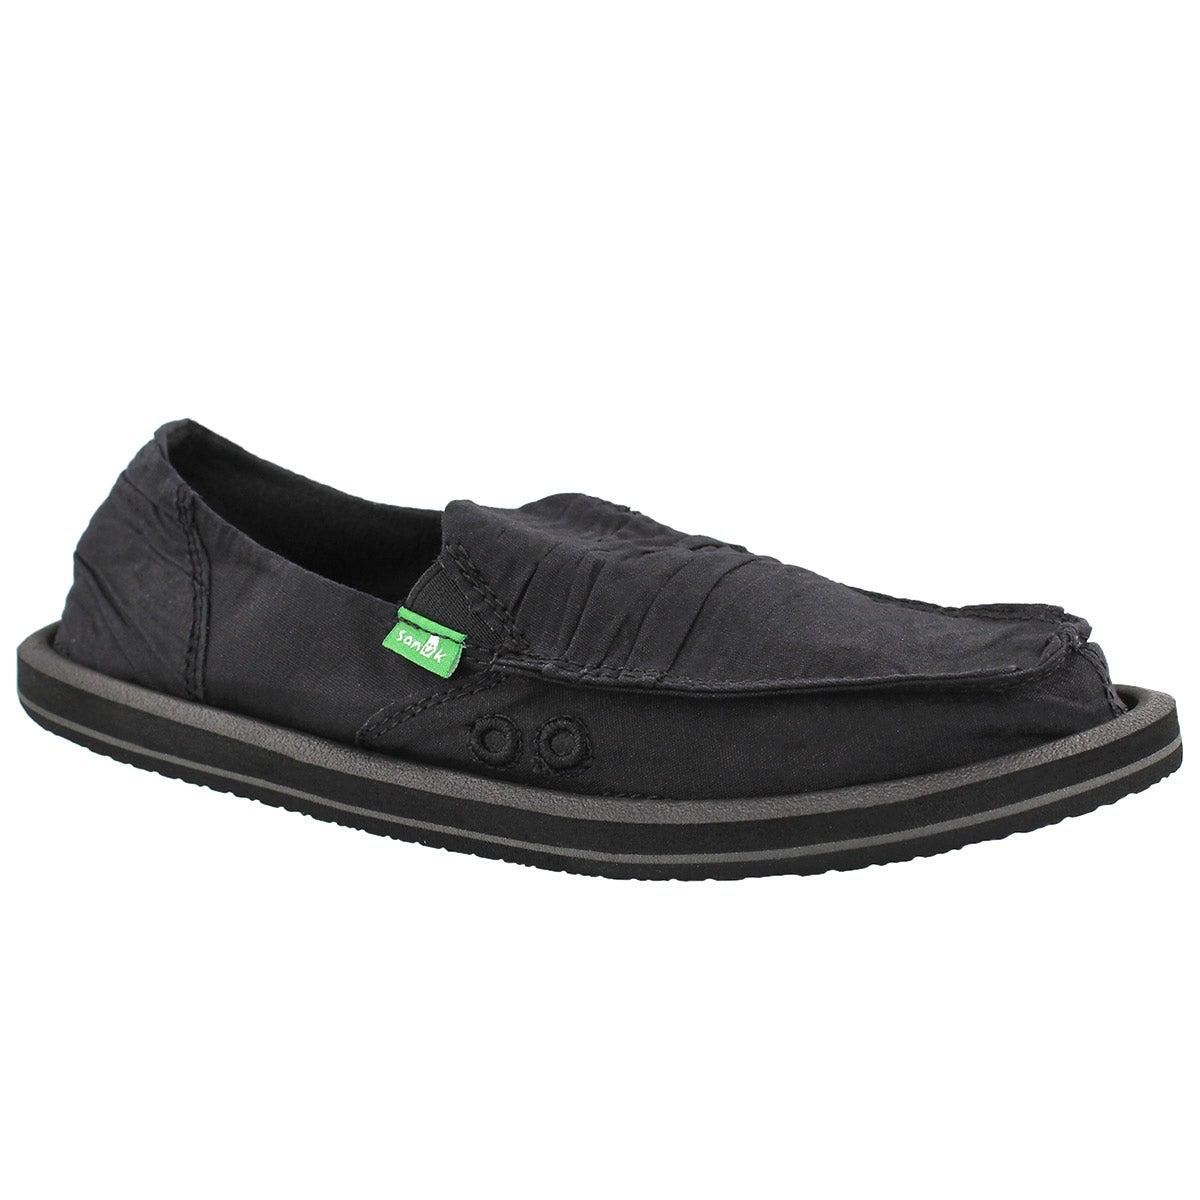 Women's SHUFFLE black slip on shoes